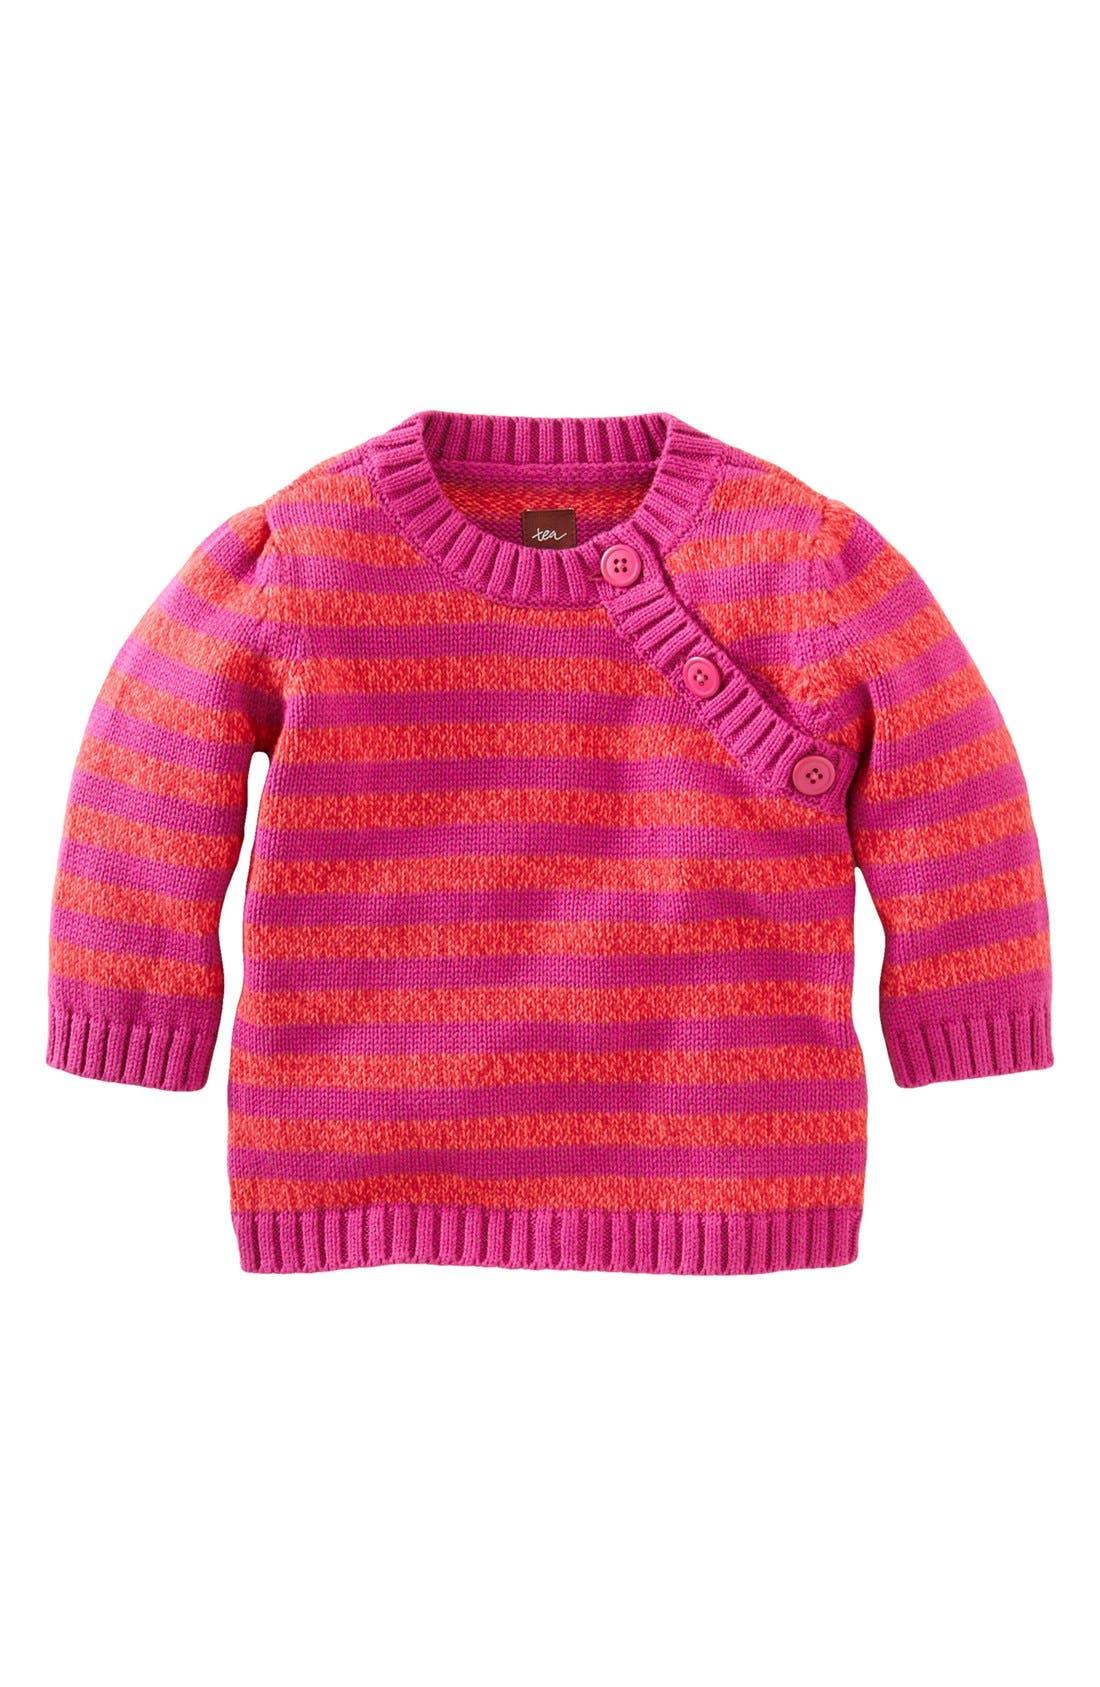 Main Image - Tea Collection Marled Stripe Sweater (Little Girls & Big Girls)